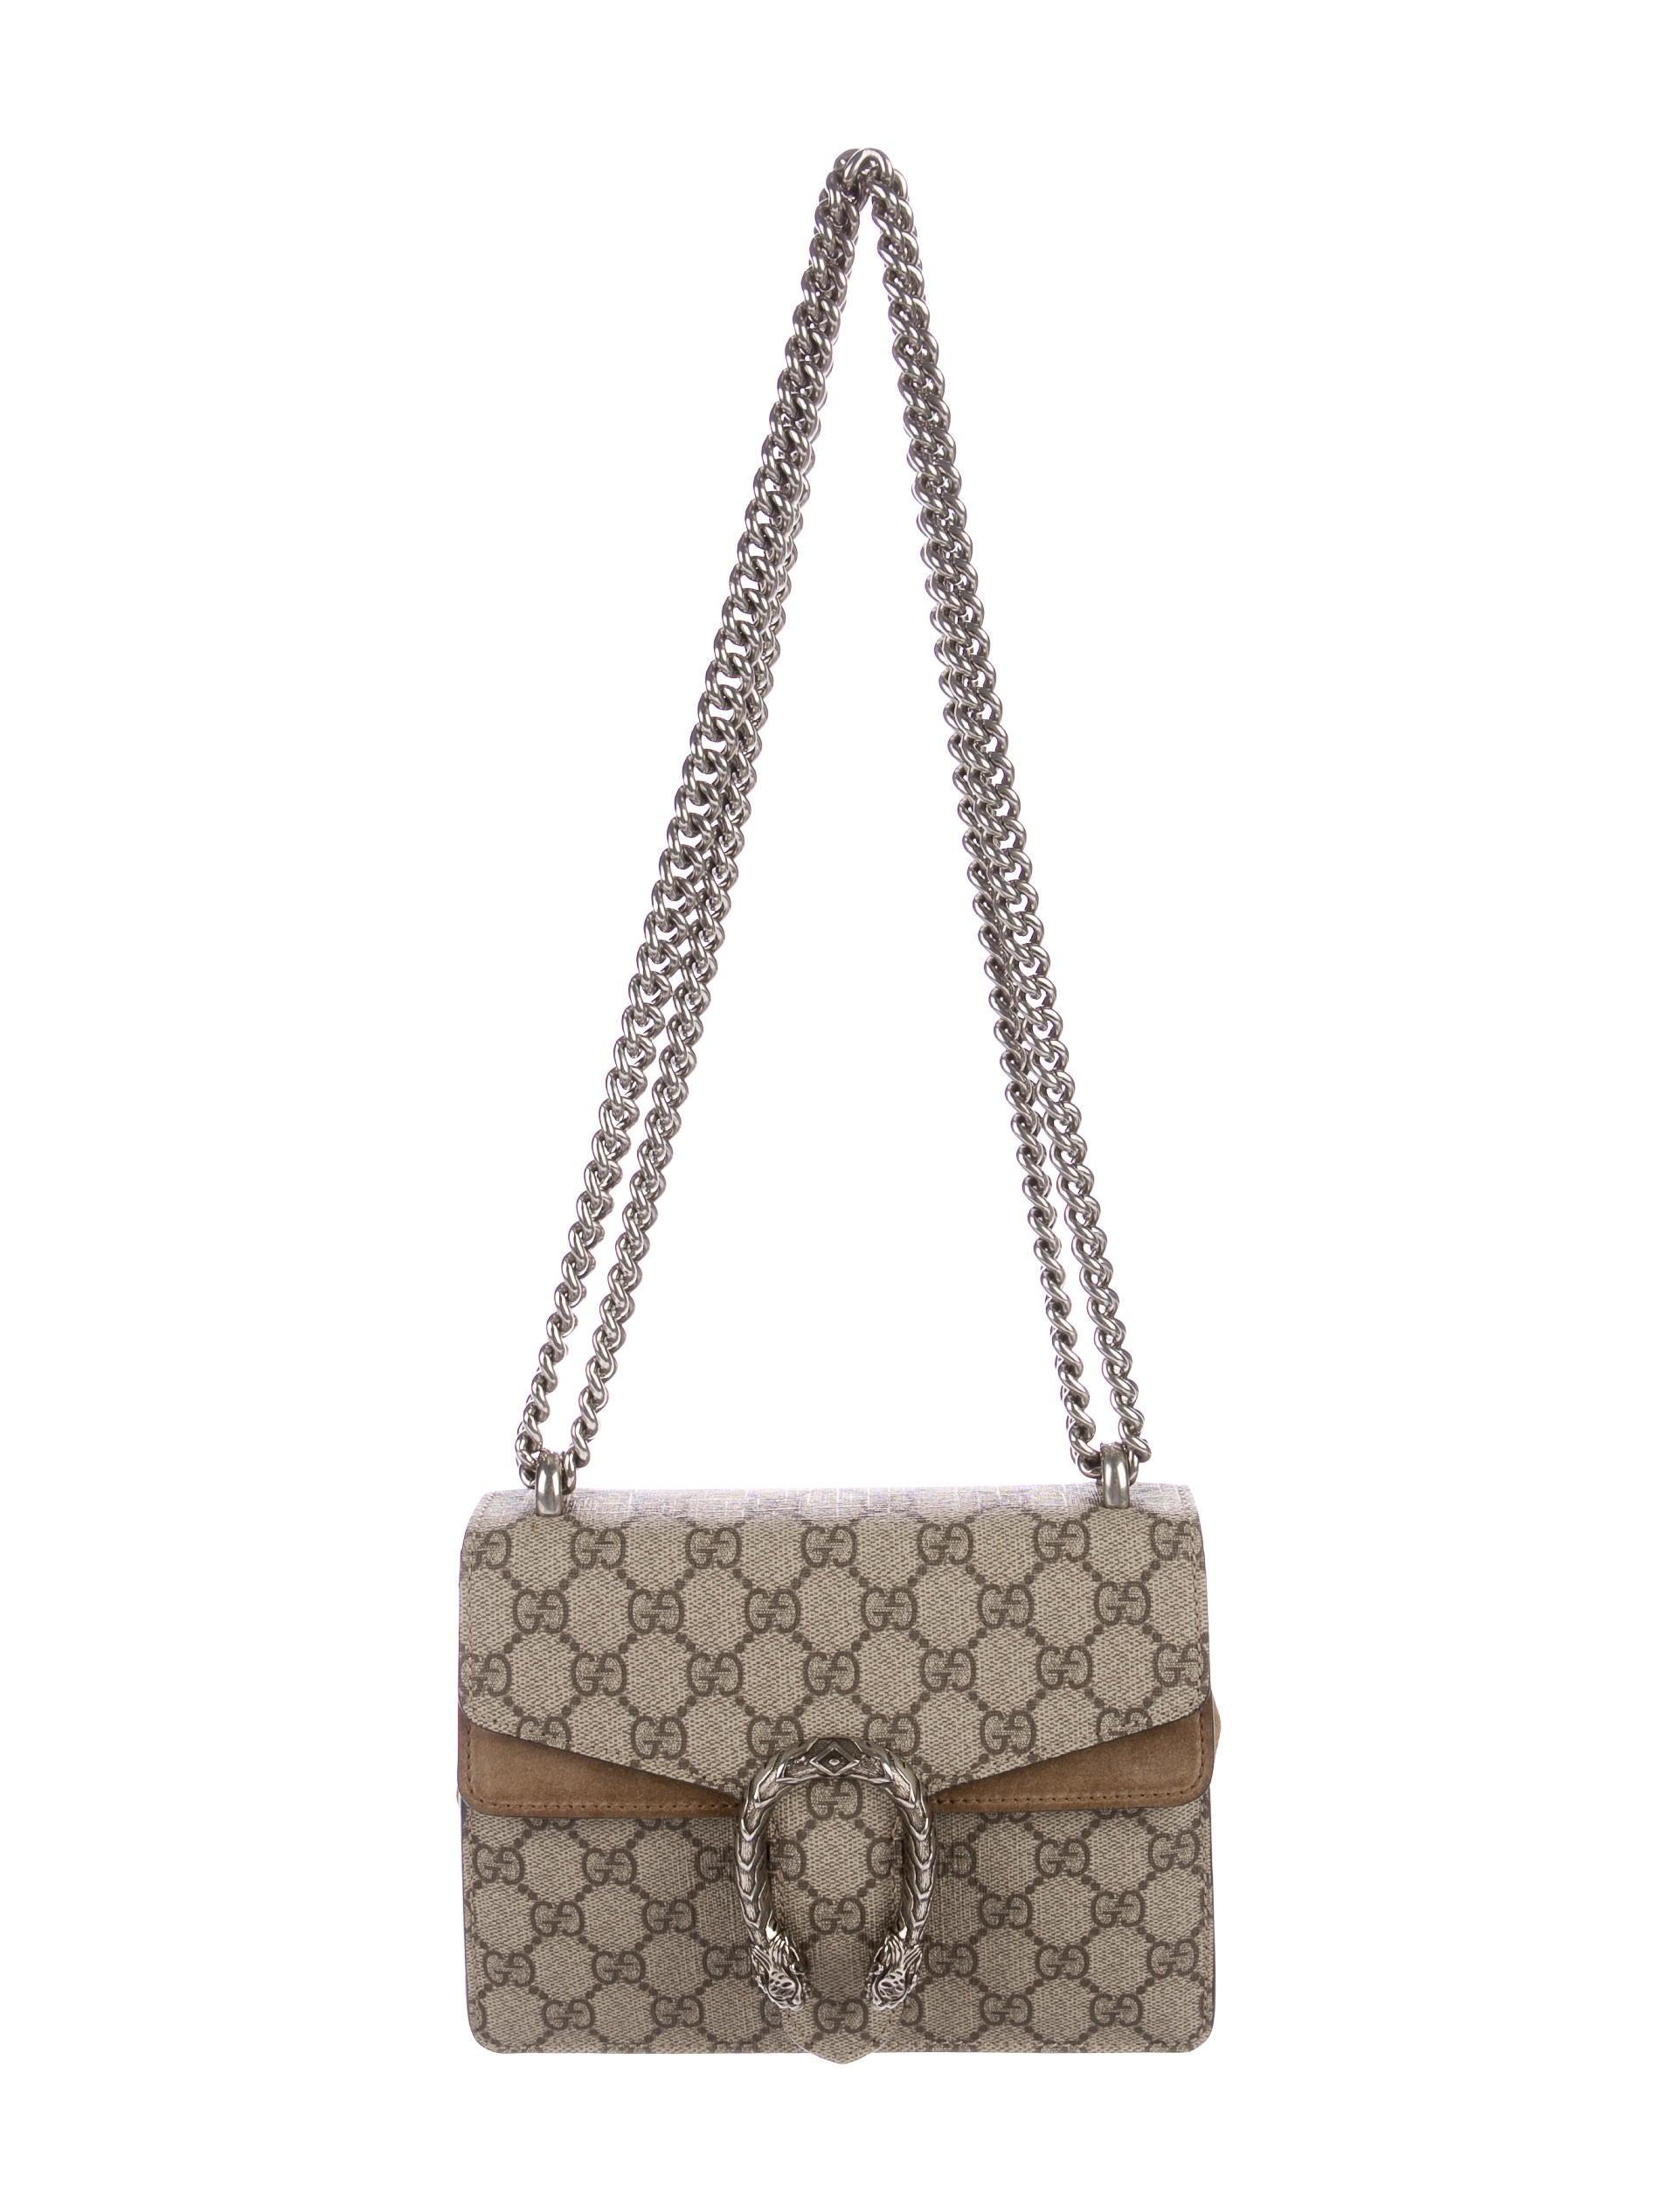 c28fe413c35e Gucci GG Supreme Mini Dionysus Bag - Handbags - GUC156198 | The RealReal